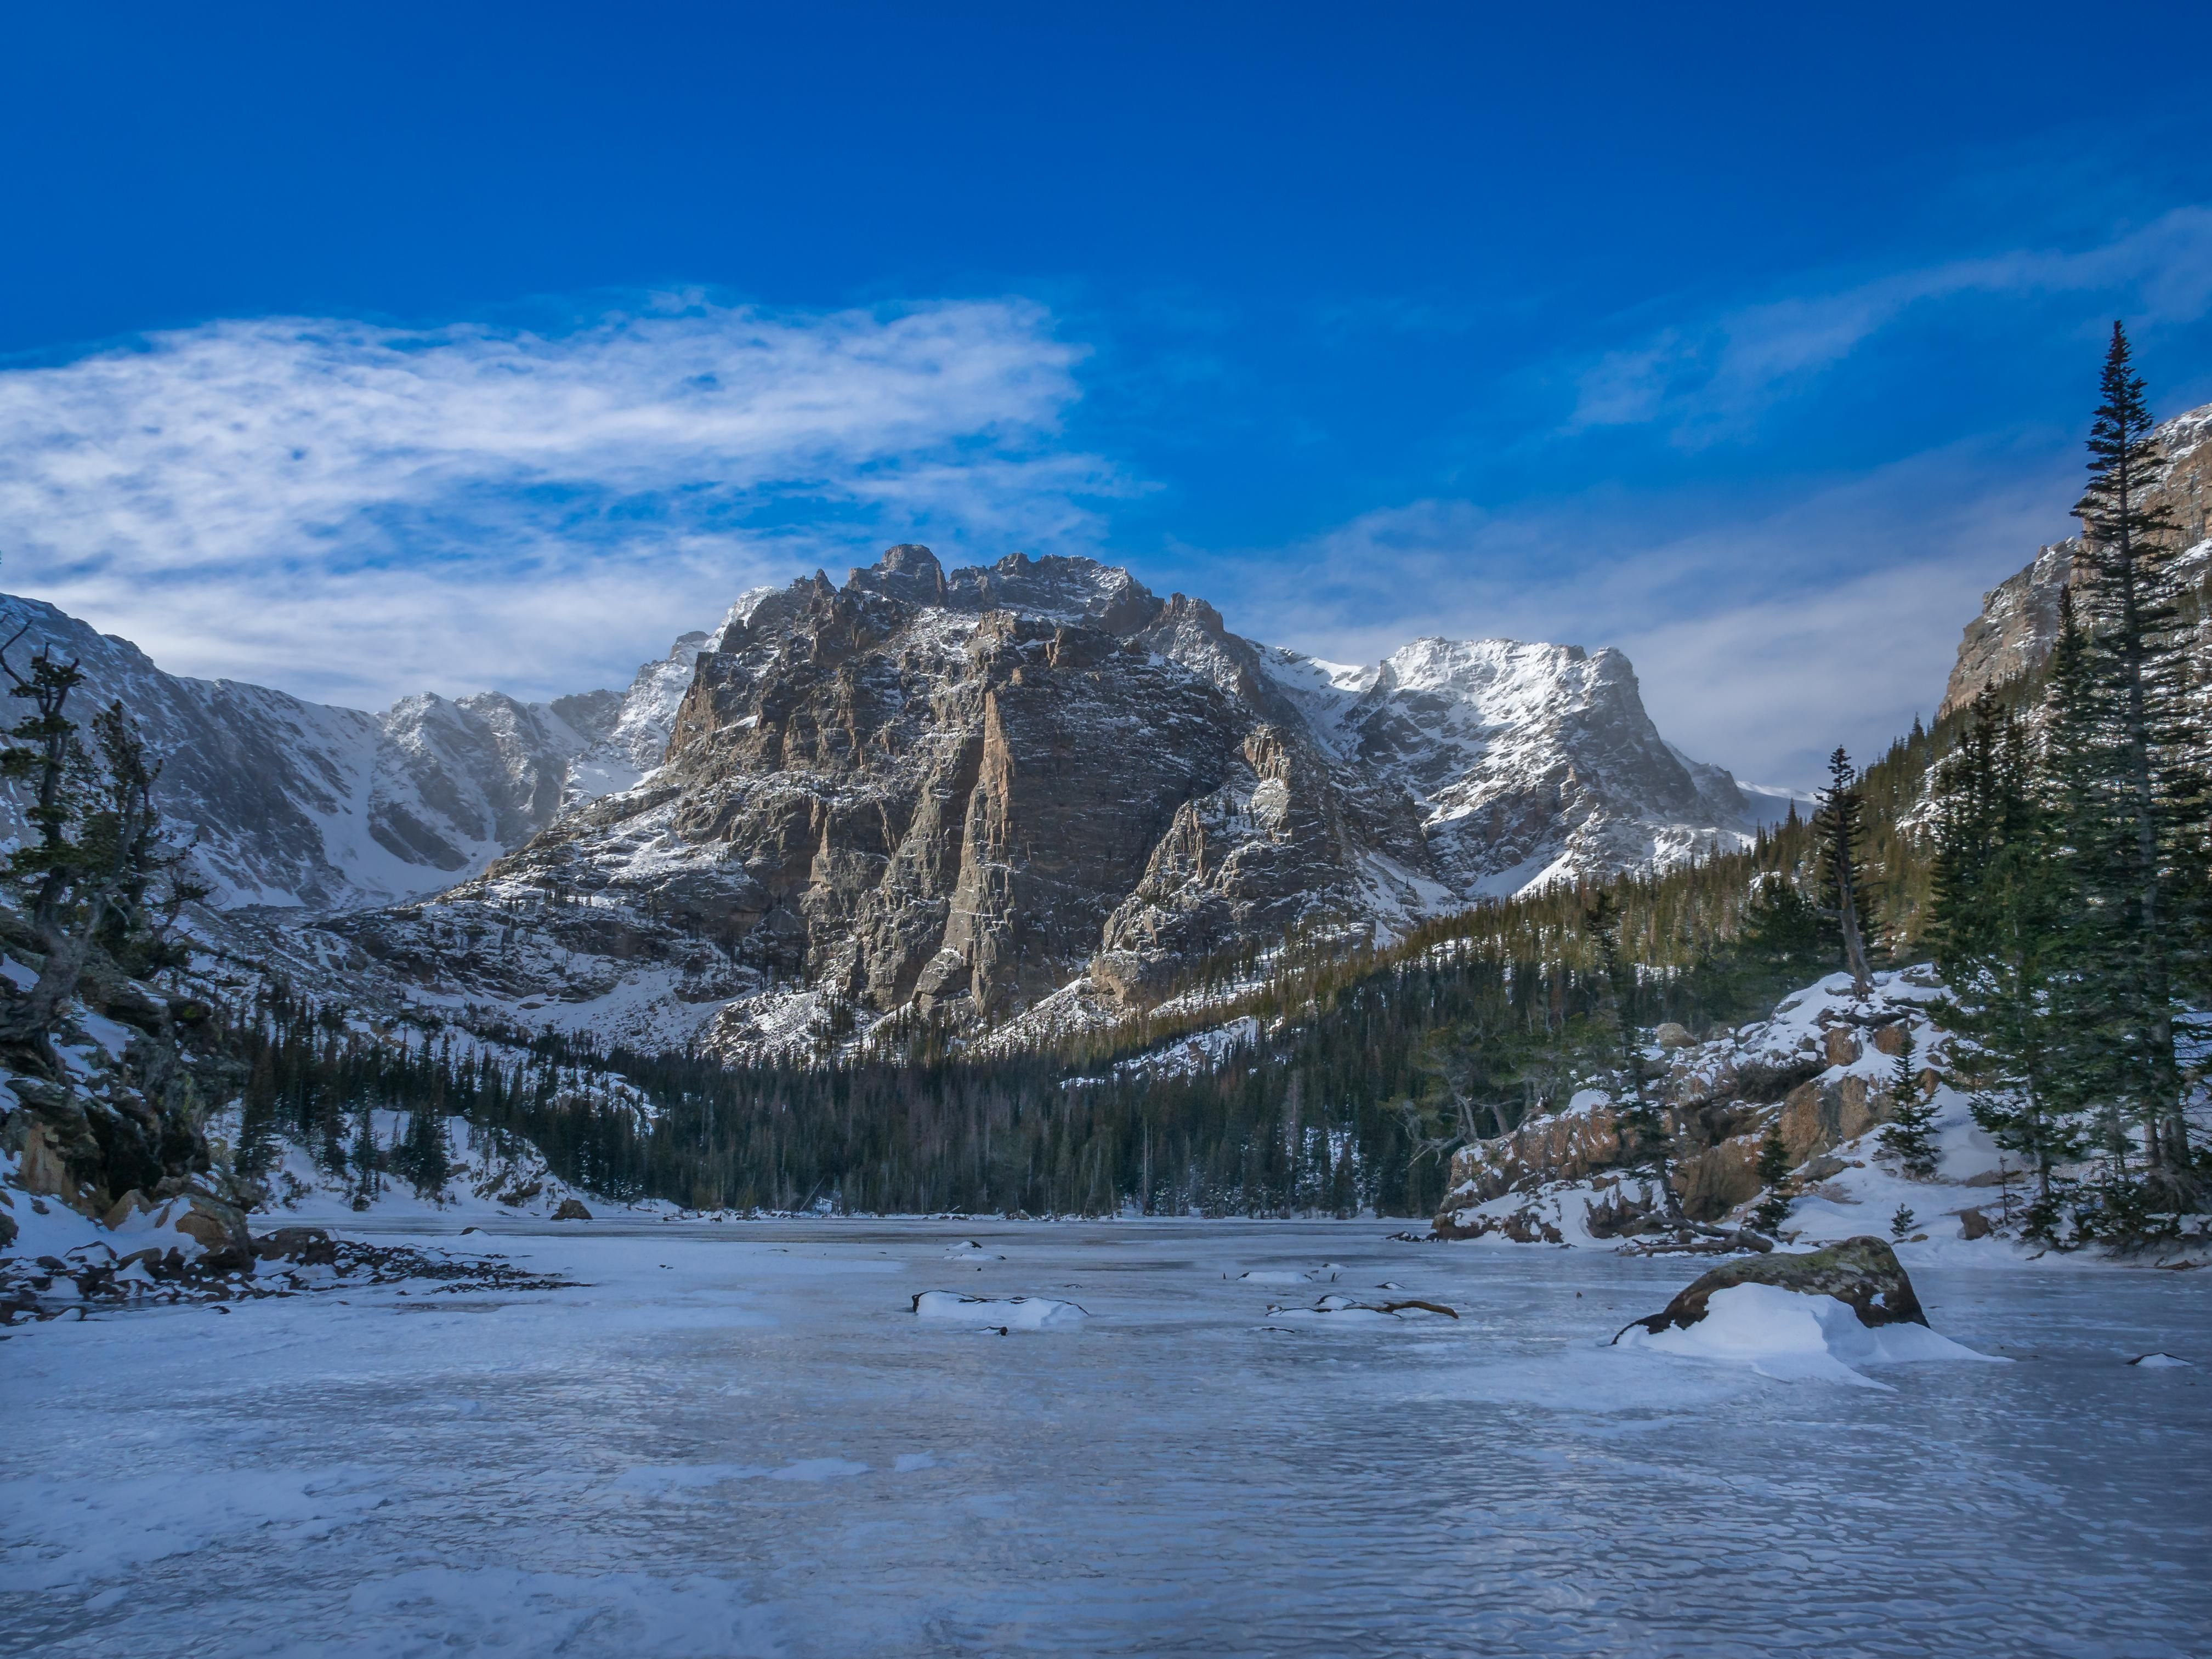 Frozen Loch Lake Rocky Mountain National Park Co Oc 4034 3026 Reddit Rocky Mountain National Park Rocky Mountains National Parks